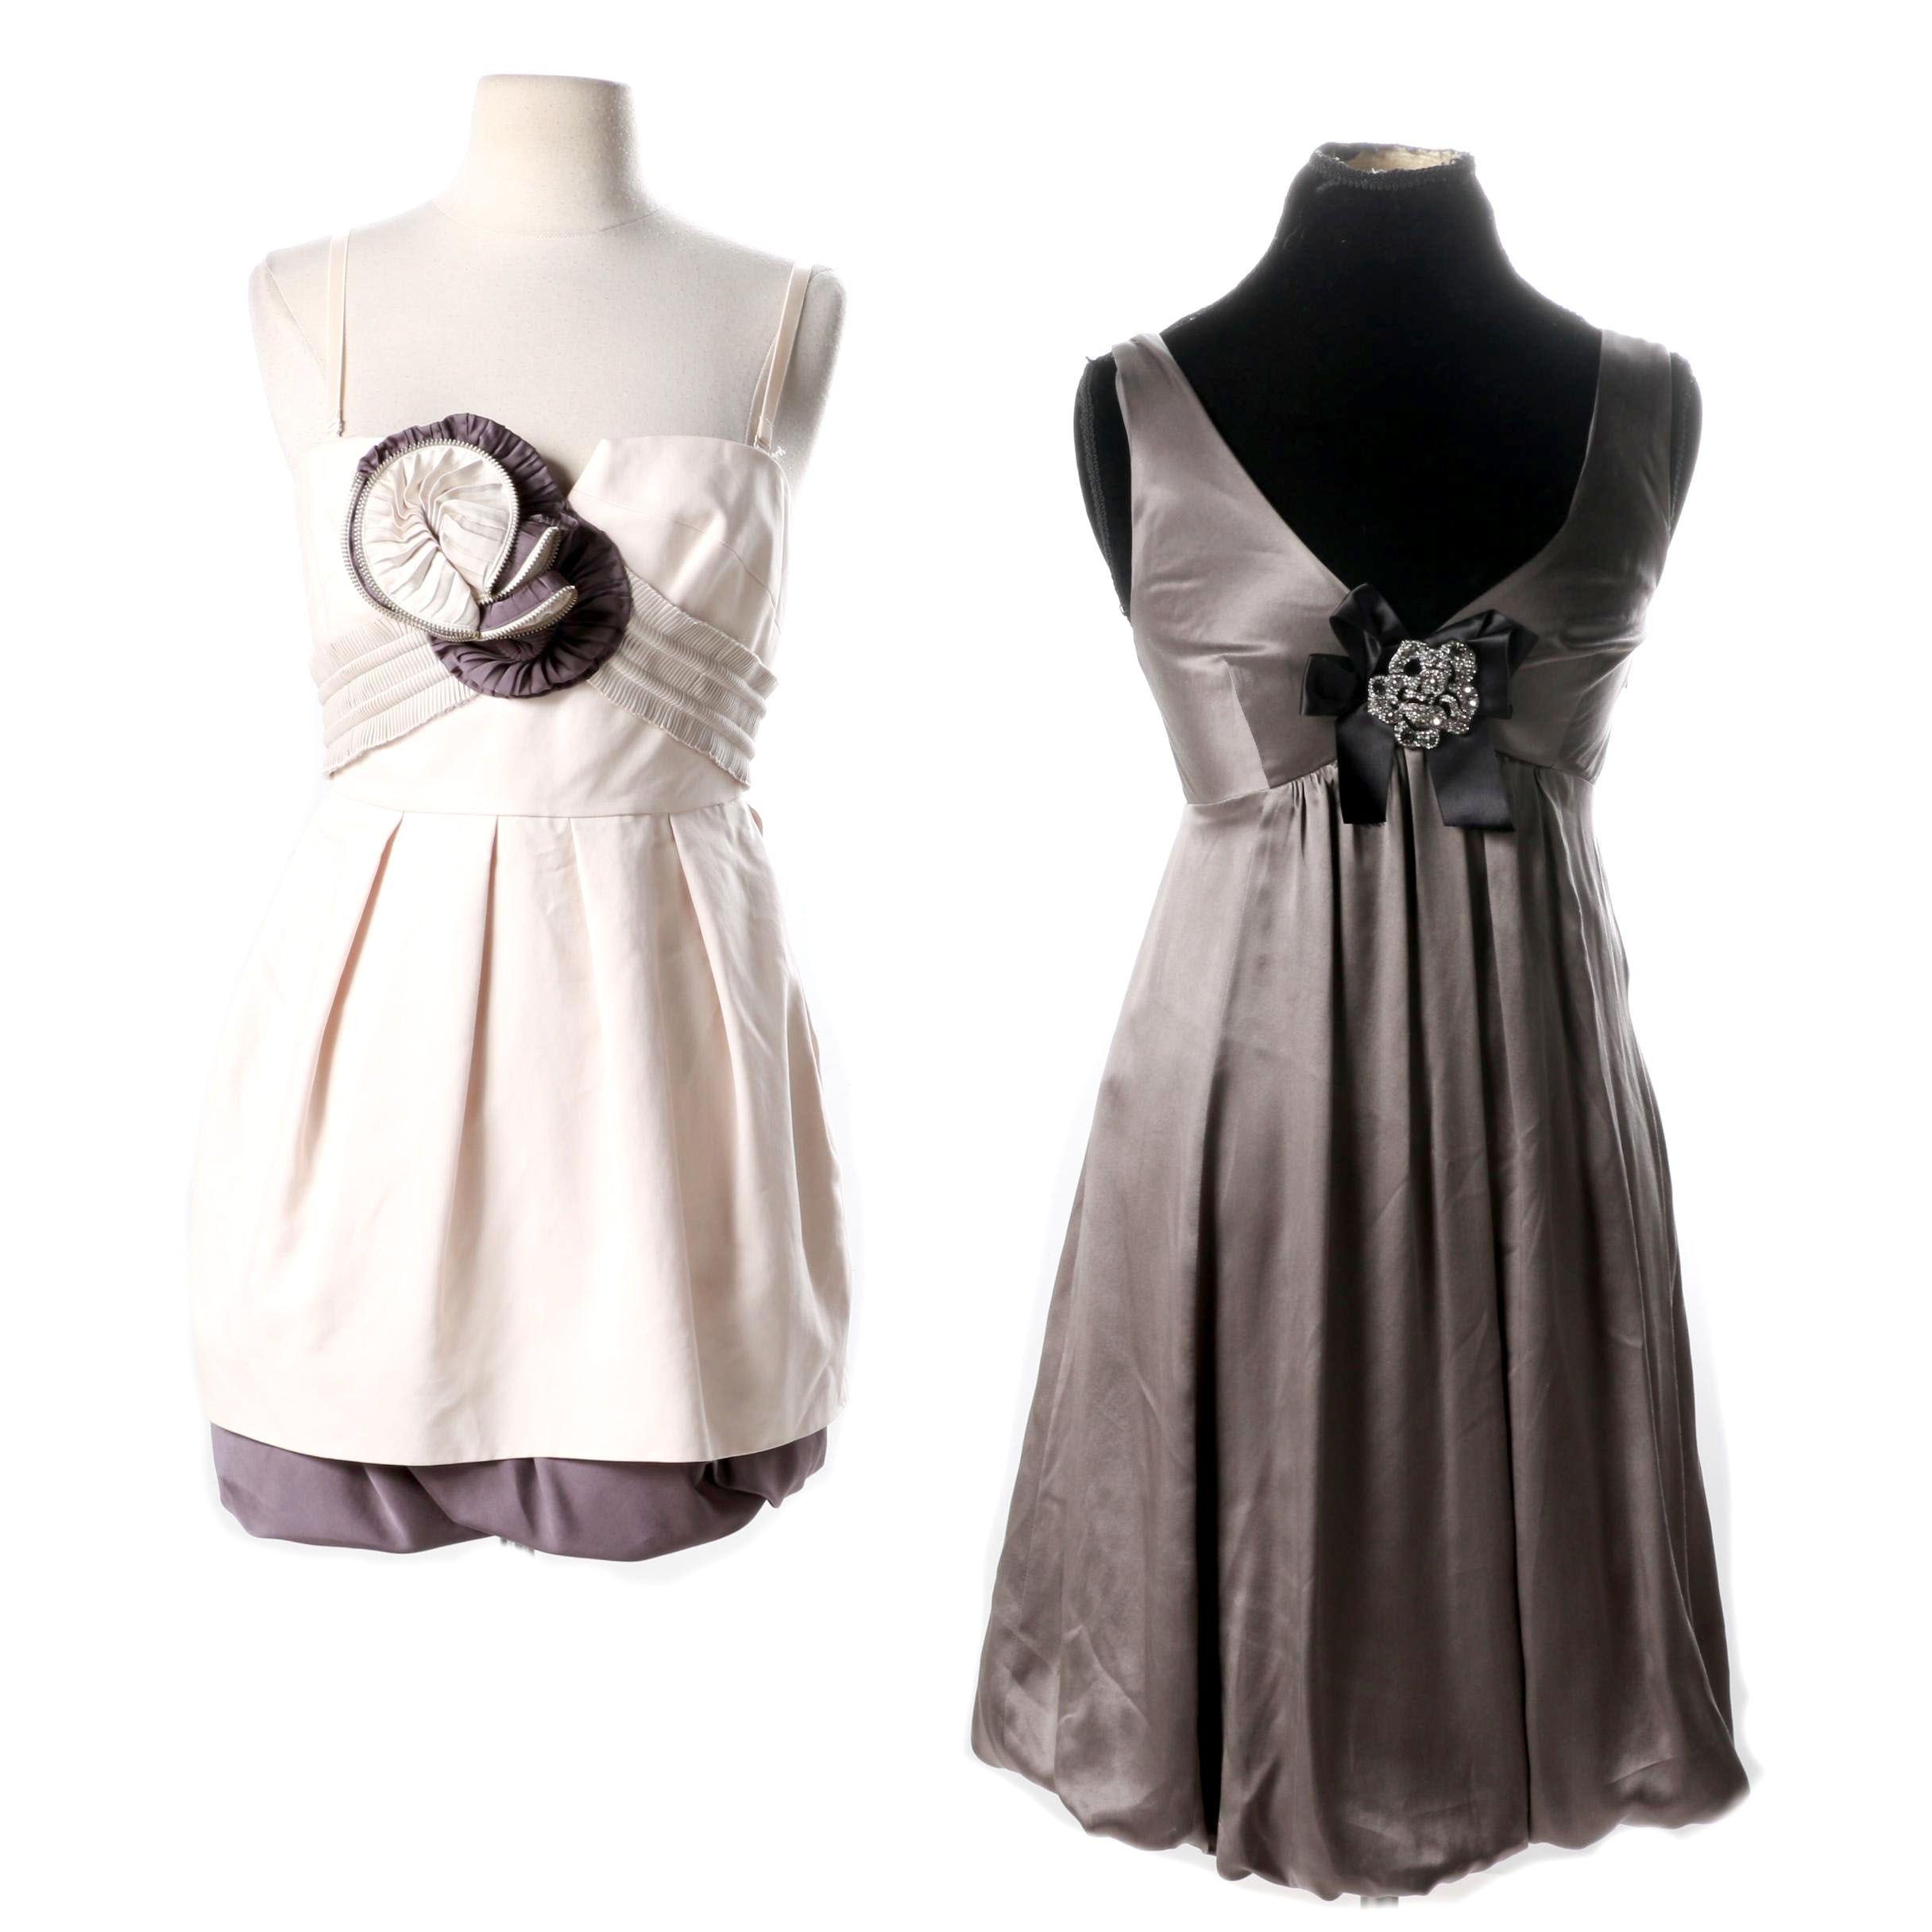 Two BCBG MaxAzaria Dresses